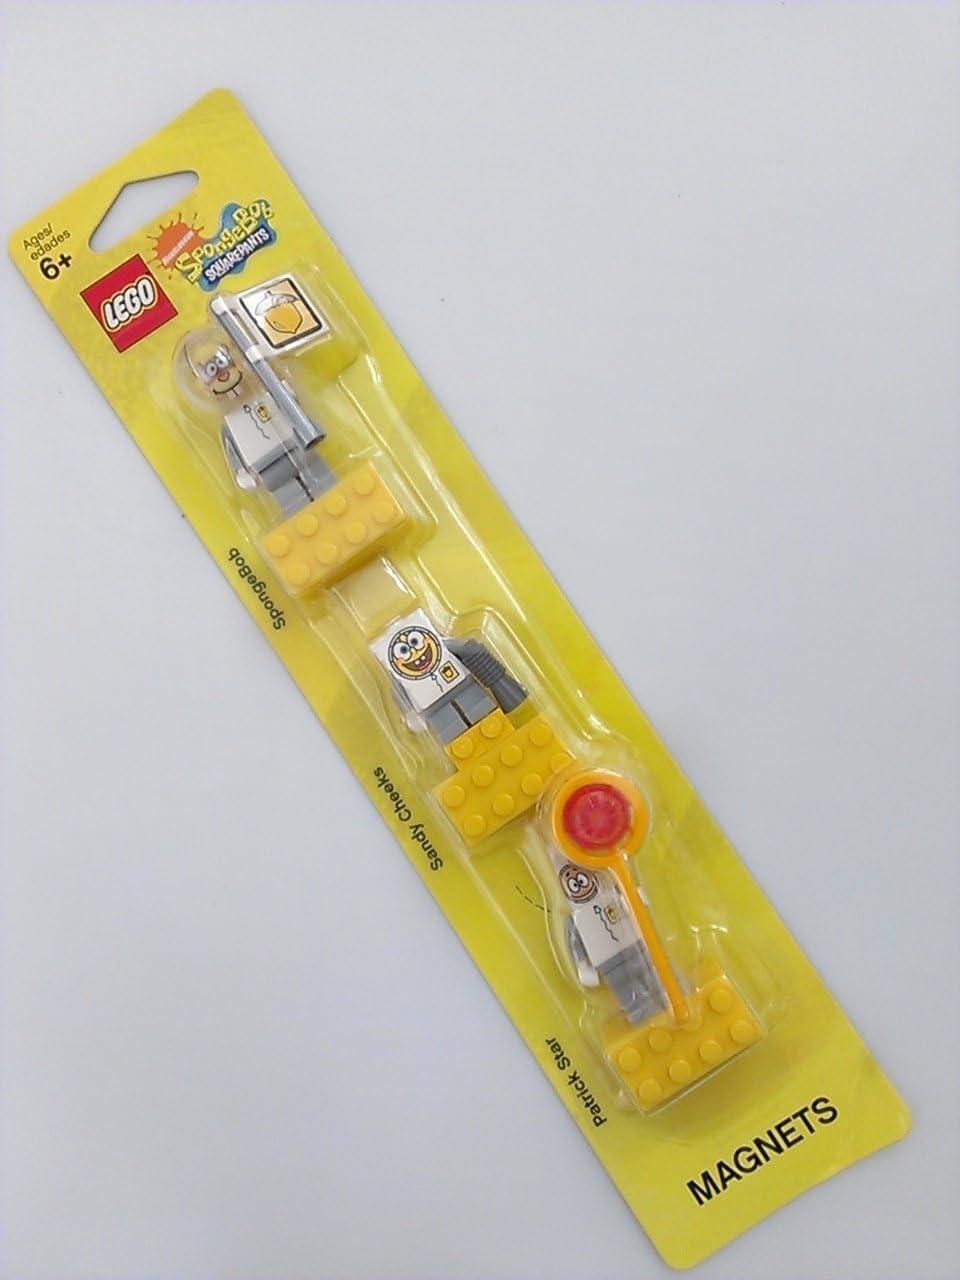 LEGO SpongeBob Spacesuit Magnet Set: SpongeBob, Sandy Cheeks and Patrick / Lego SpongeBob spacesuit magnet set [Sponge Bob Square Pants, Sandy Cheeks, Patrick Star] 852 547 (japan import)